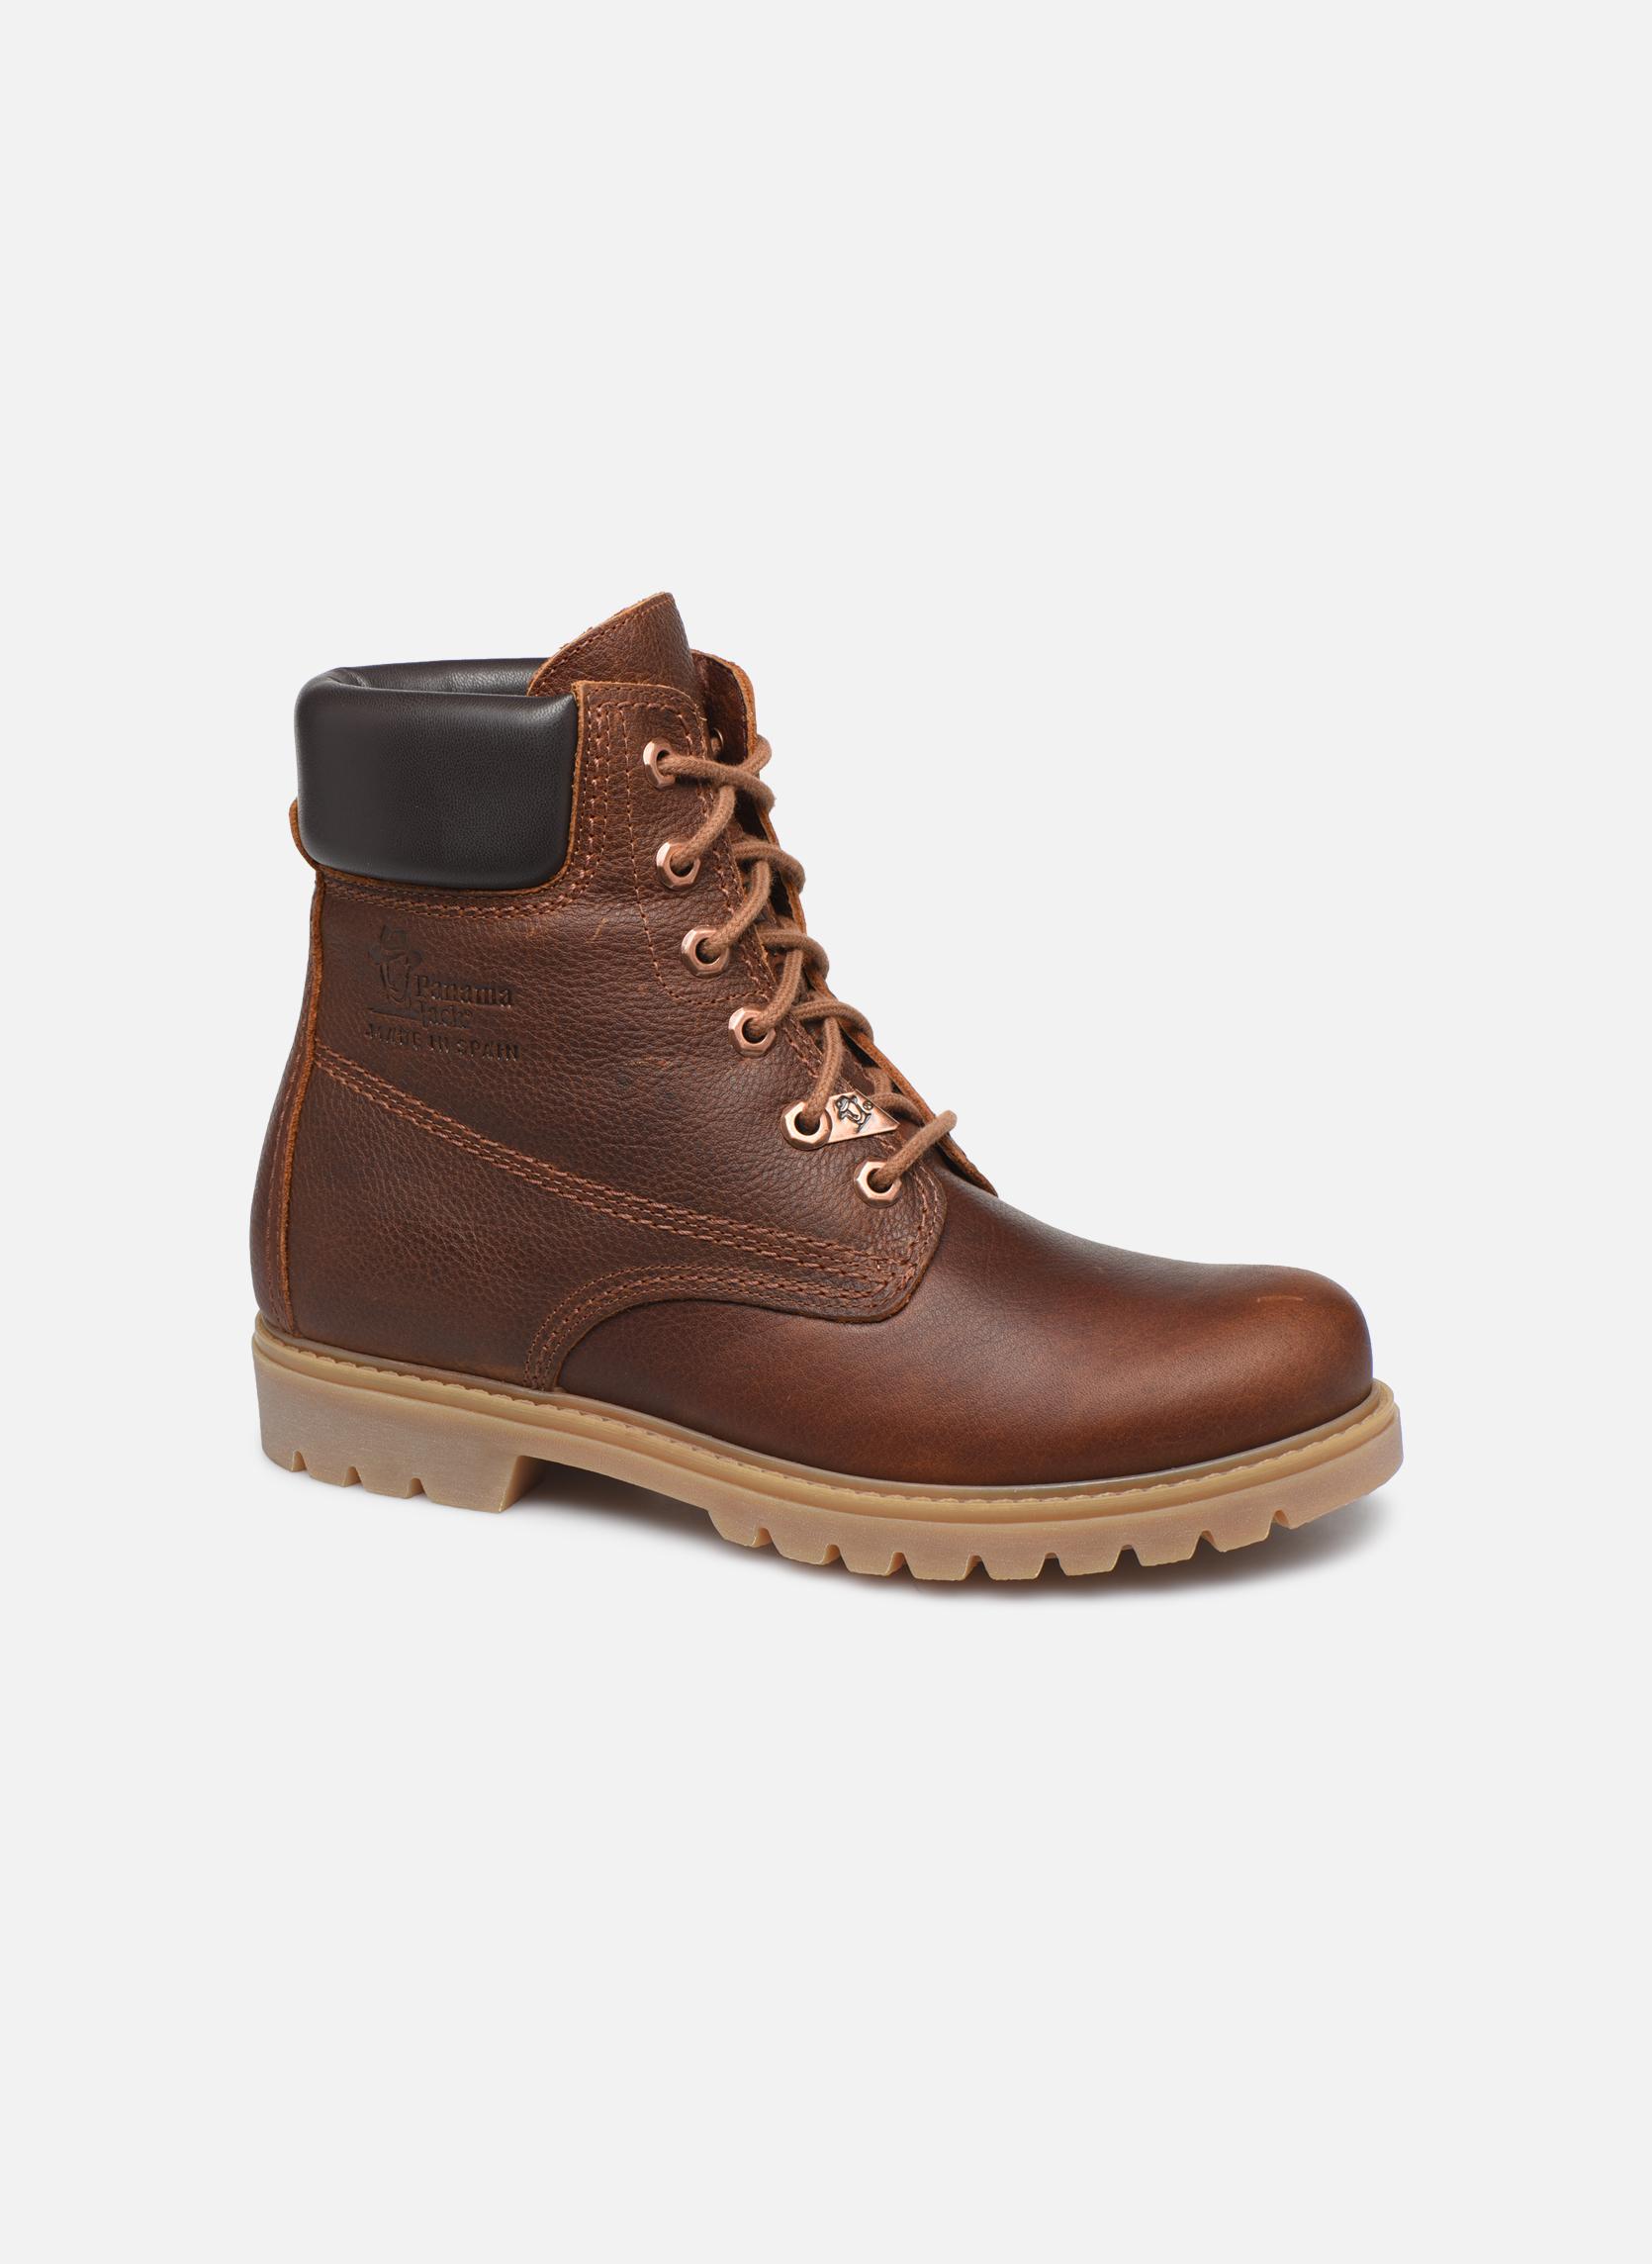 Bottines et boots Femme Panama 03 W